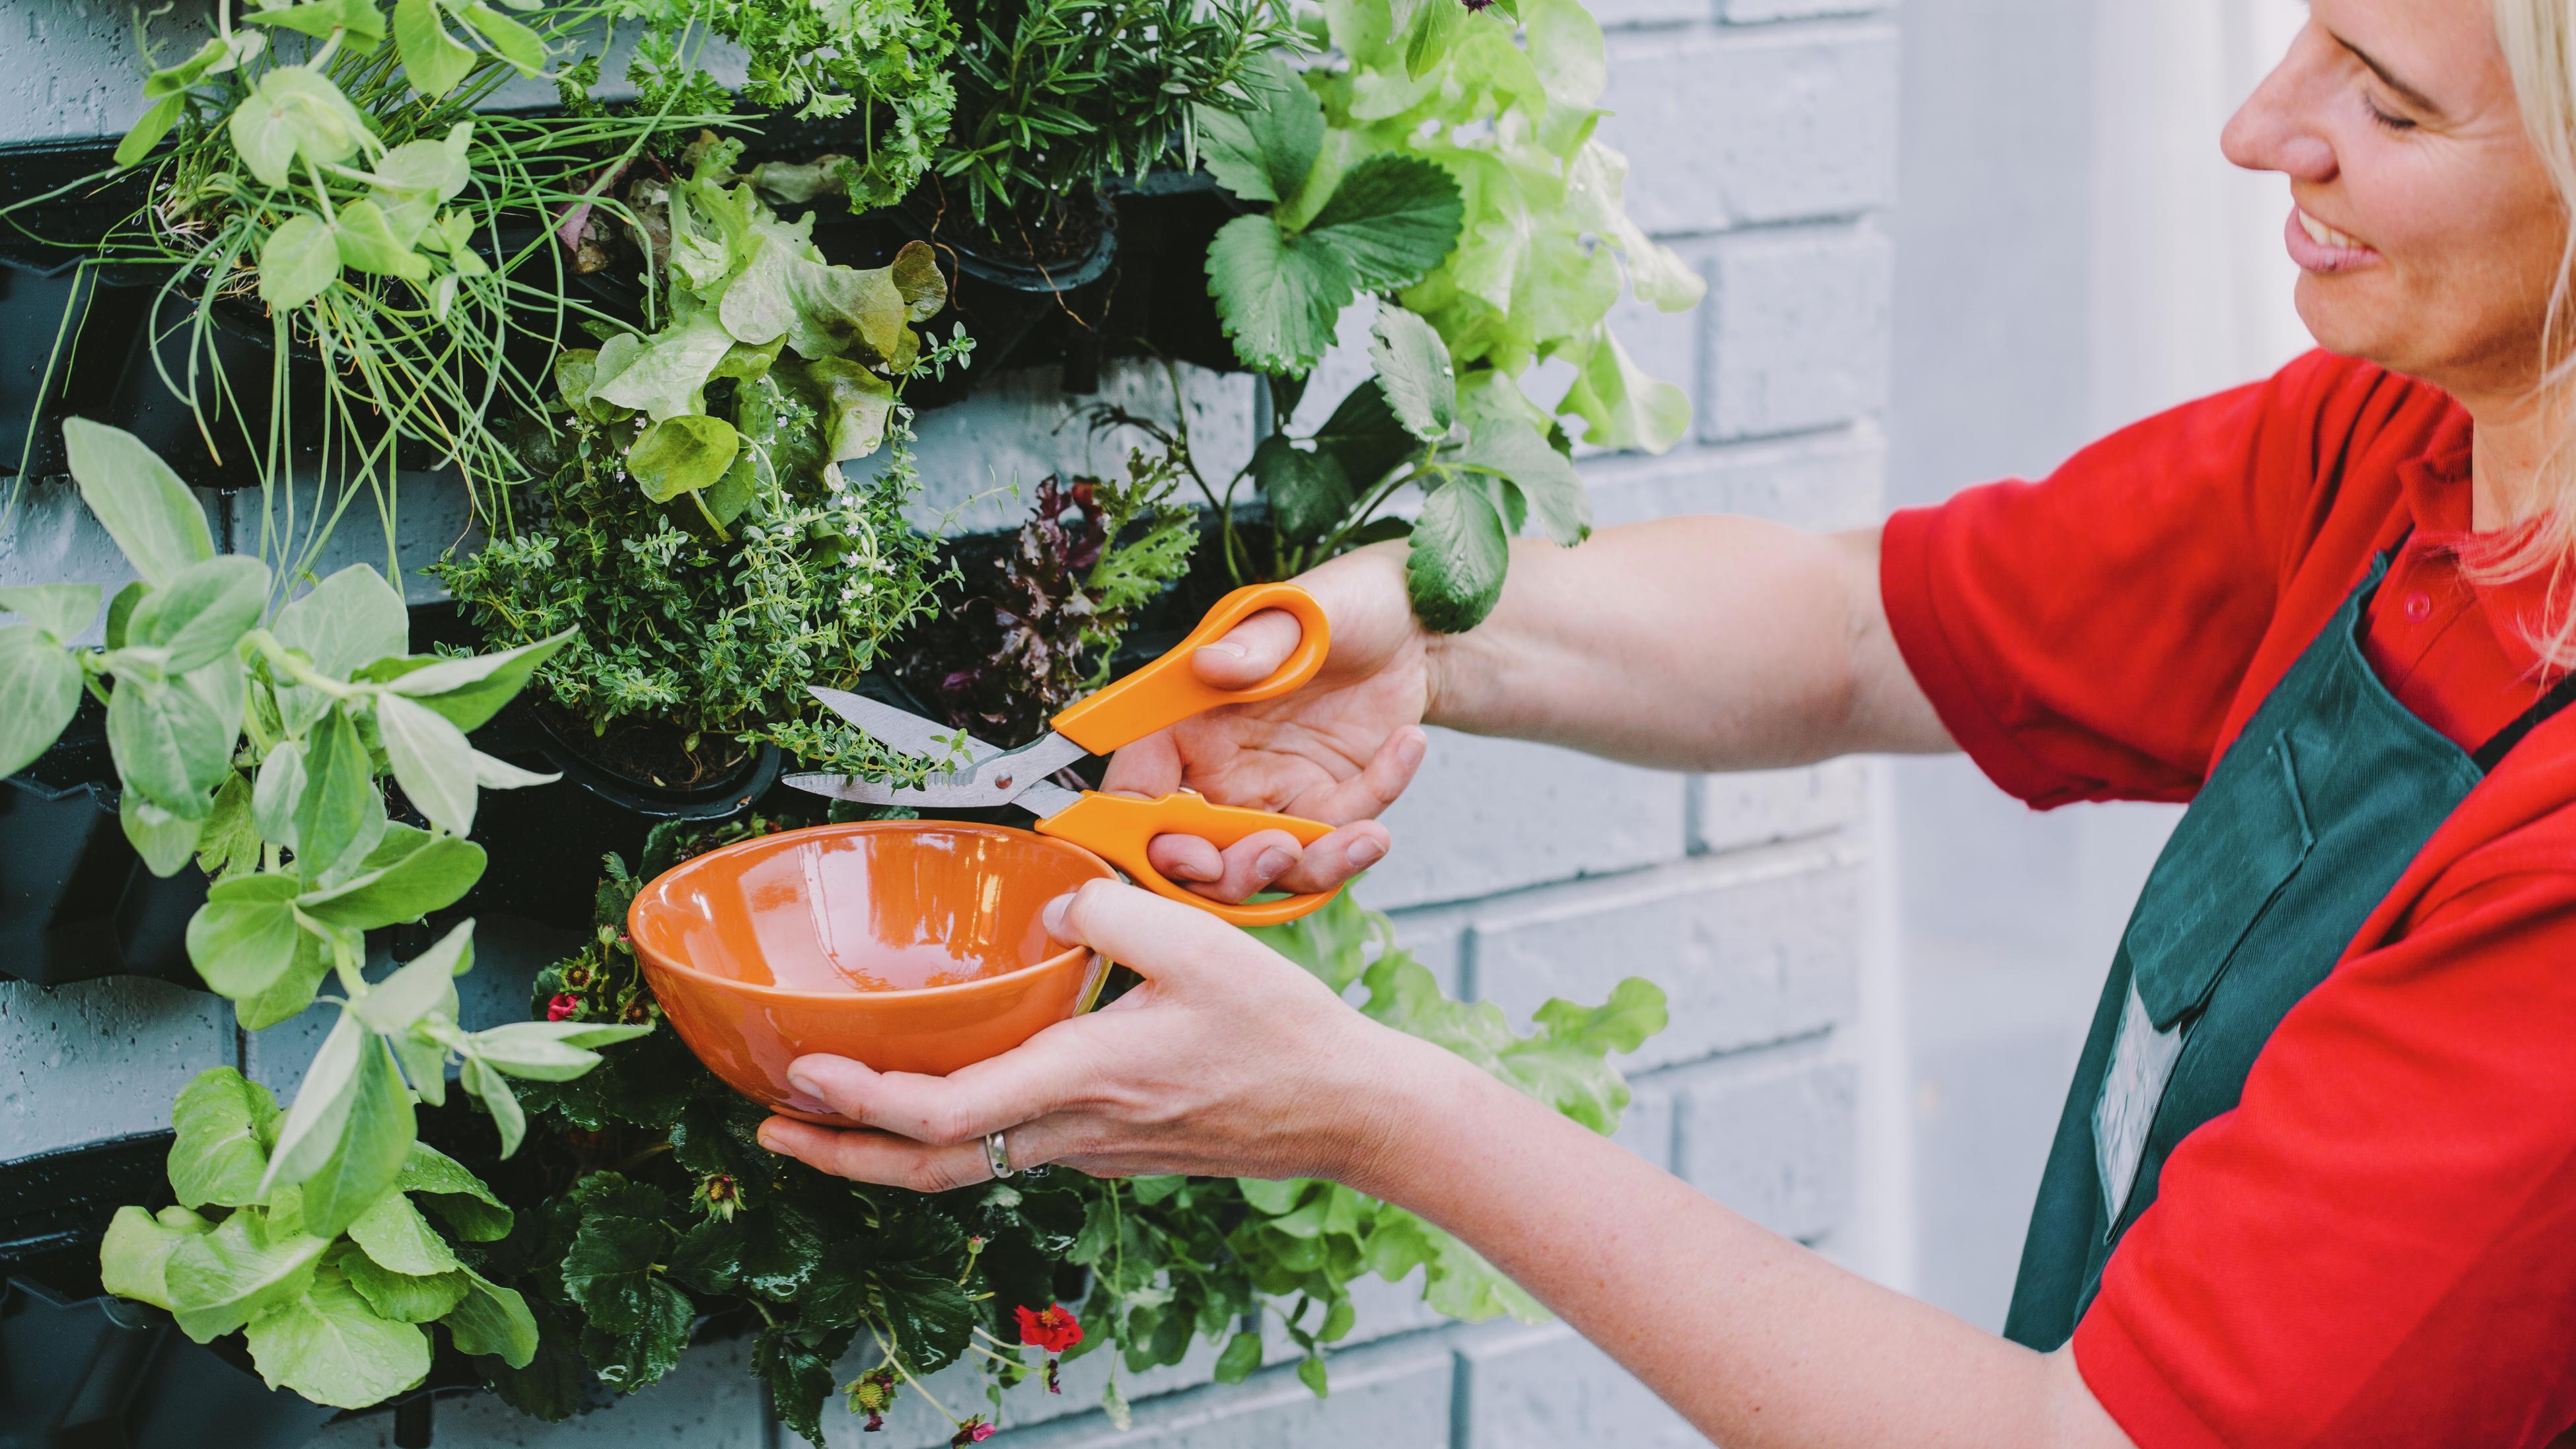 Person cutting herbs from vertical garden.